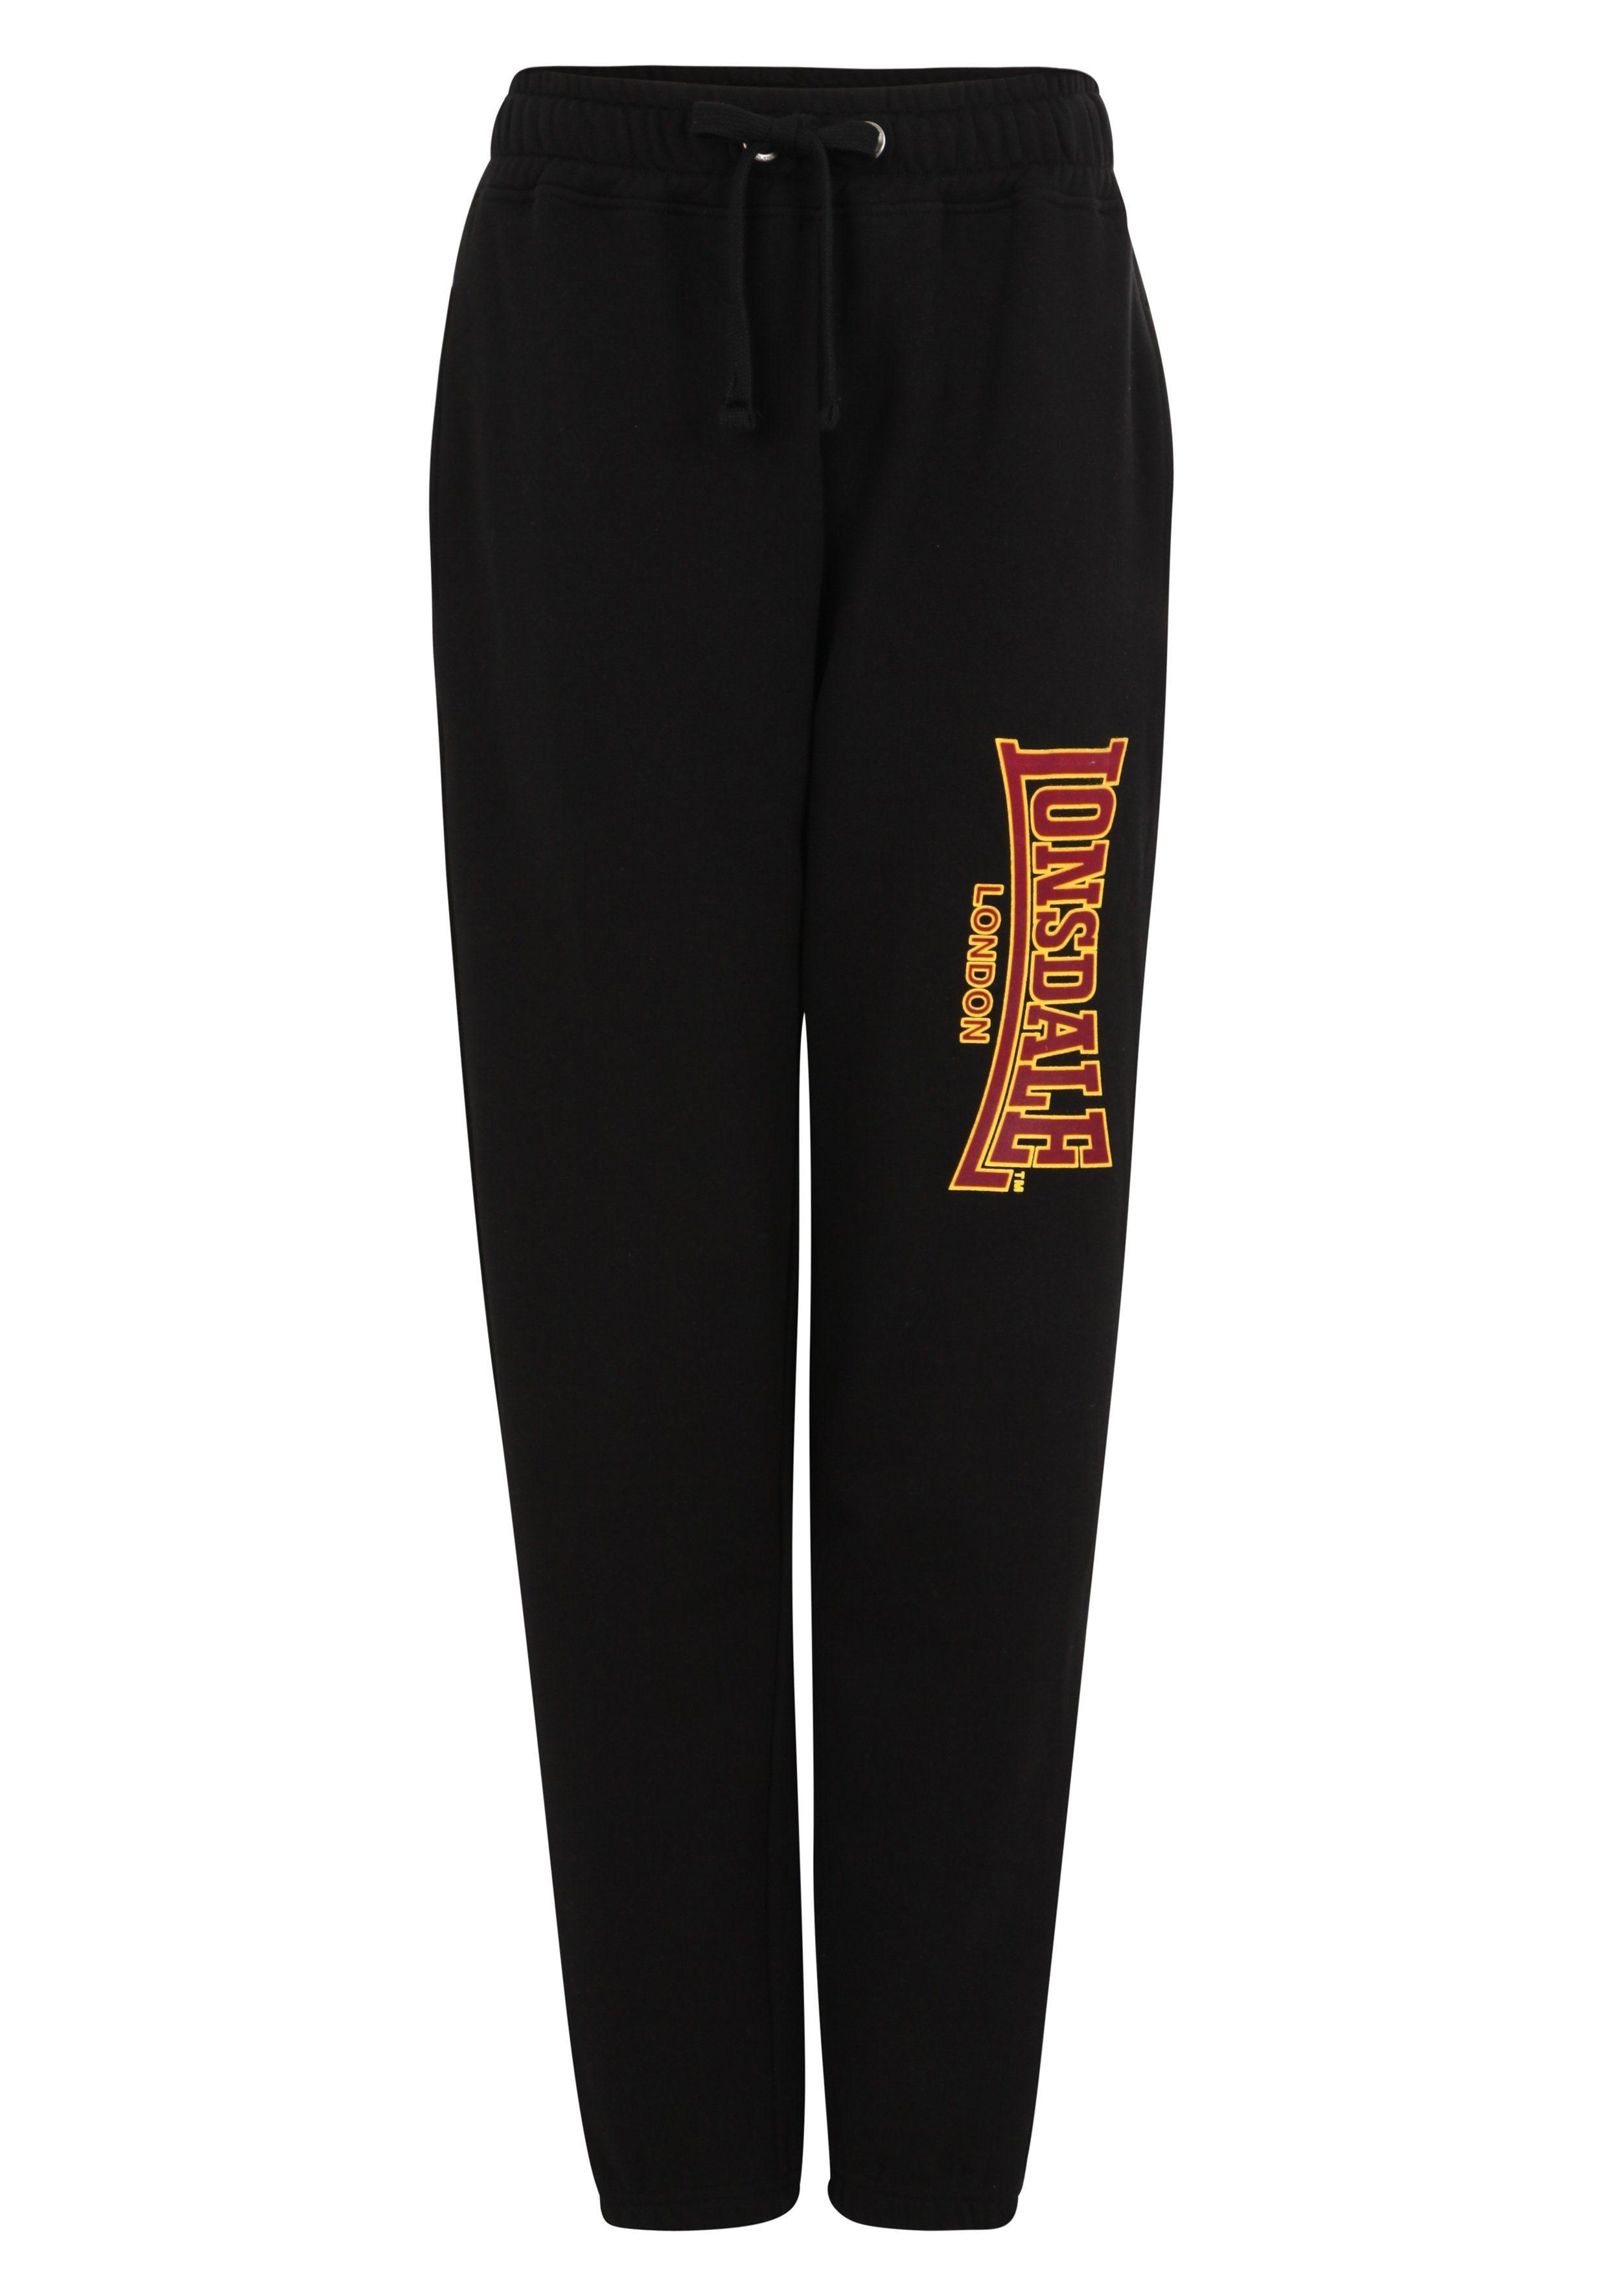 Lonsdale Jogginghose in Slim Fit-Schnitt GOOLE | Sportbekleidung > Sporthosen | Schwarz | Baumwolle - Polyester | Lonsdale